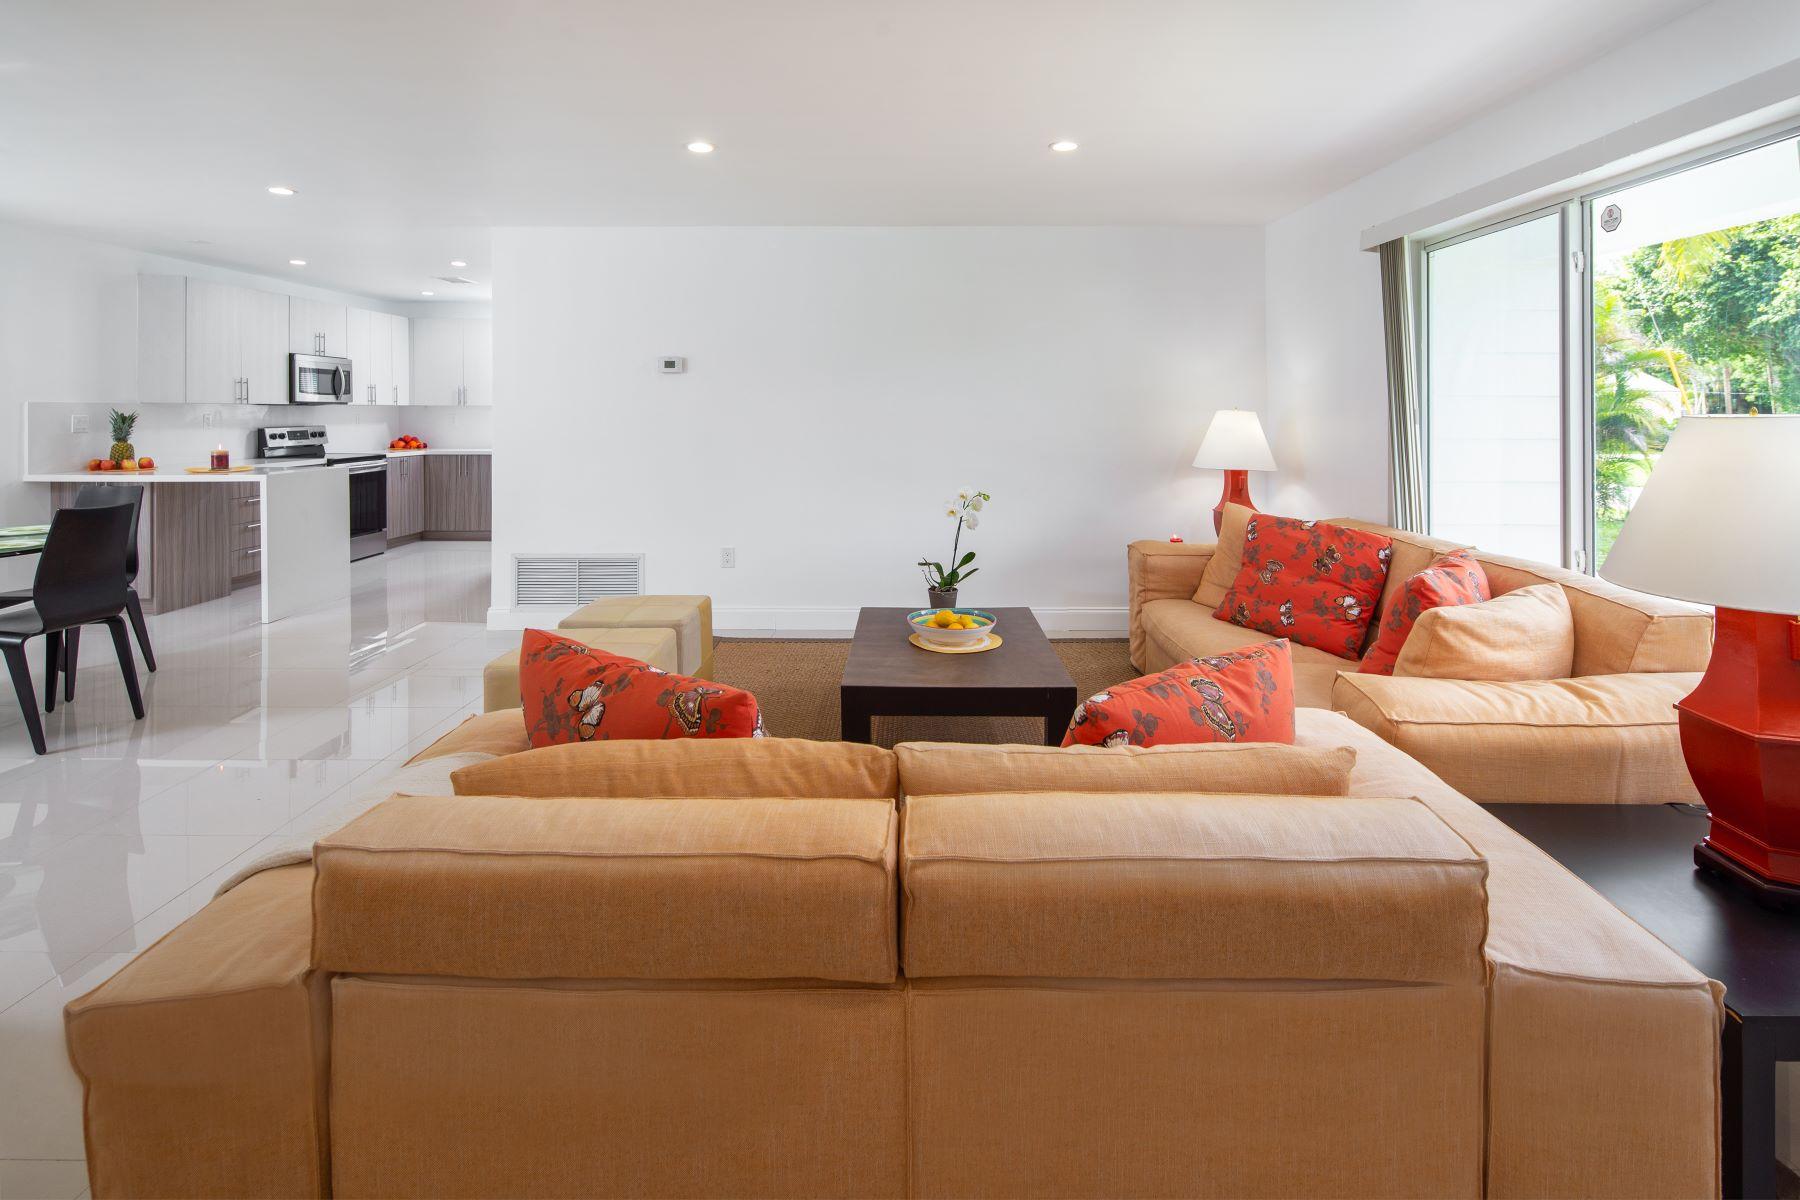 Single Family Homes のために 売買 アット Miami Shores, フロリダ 33150 アメリカ